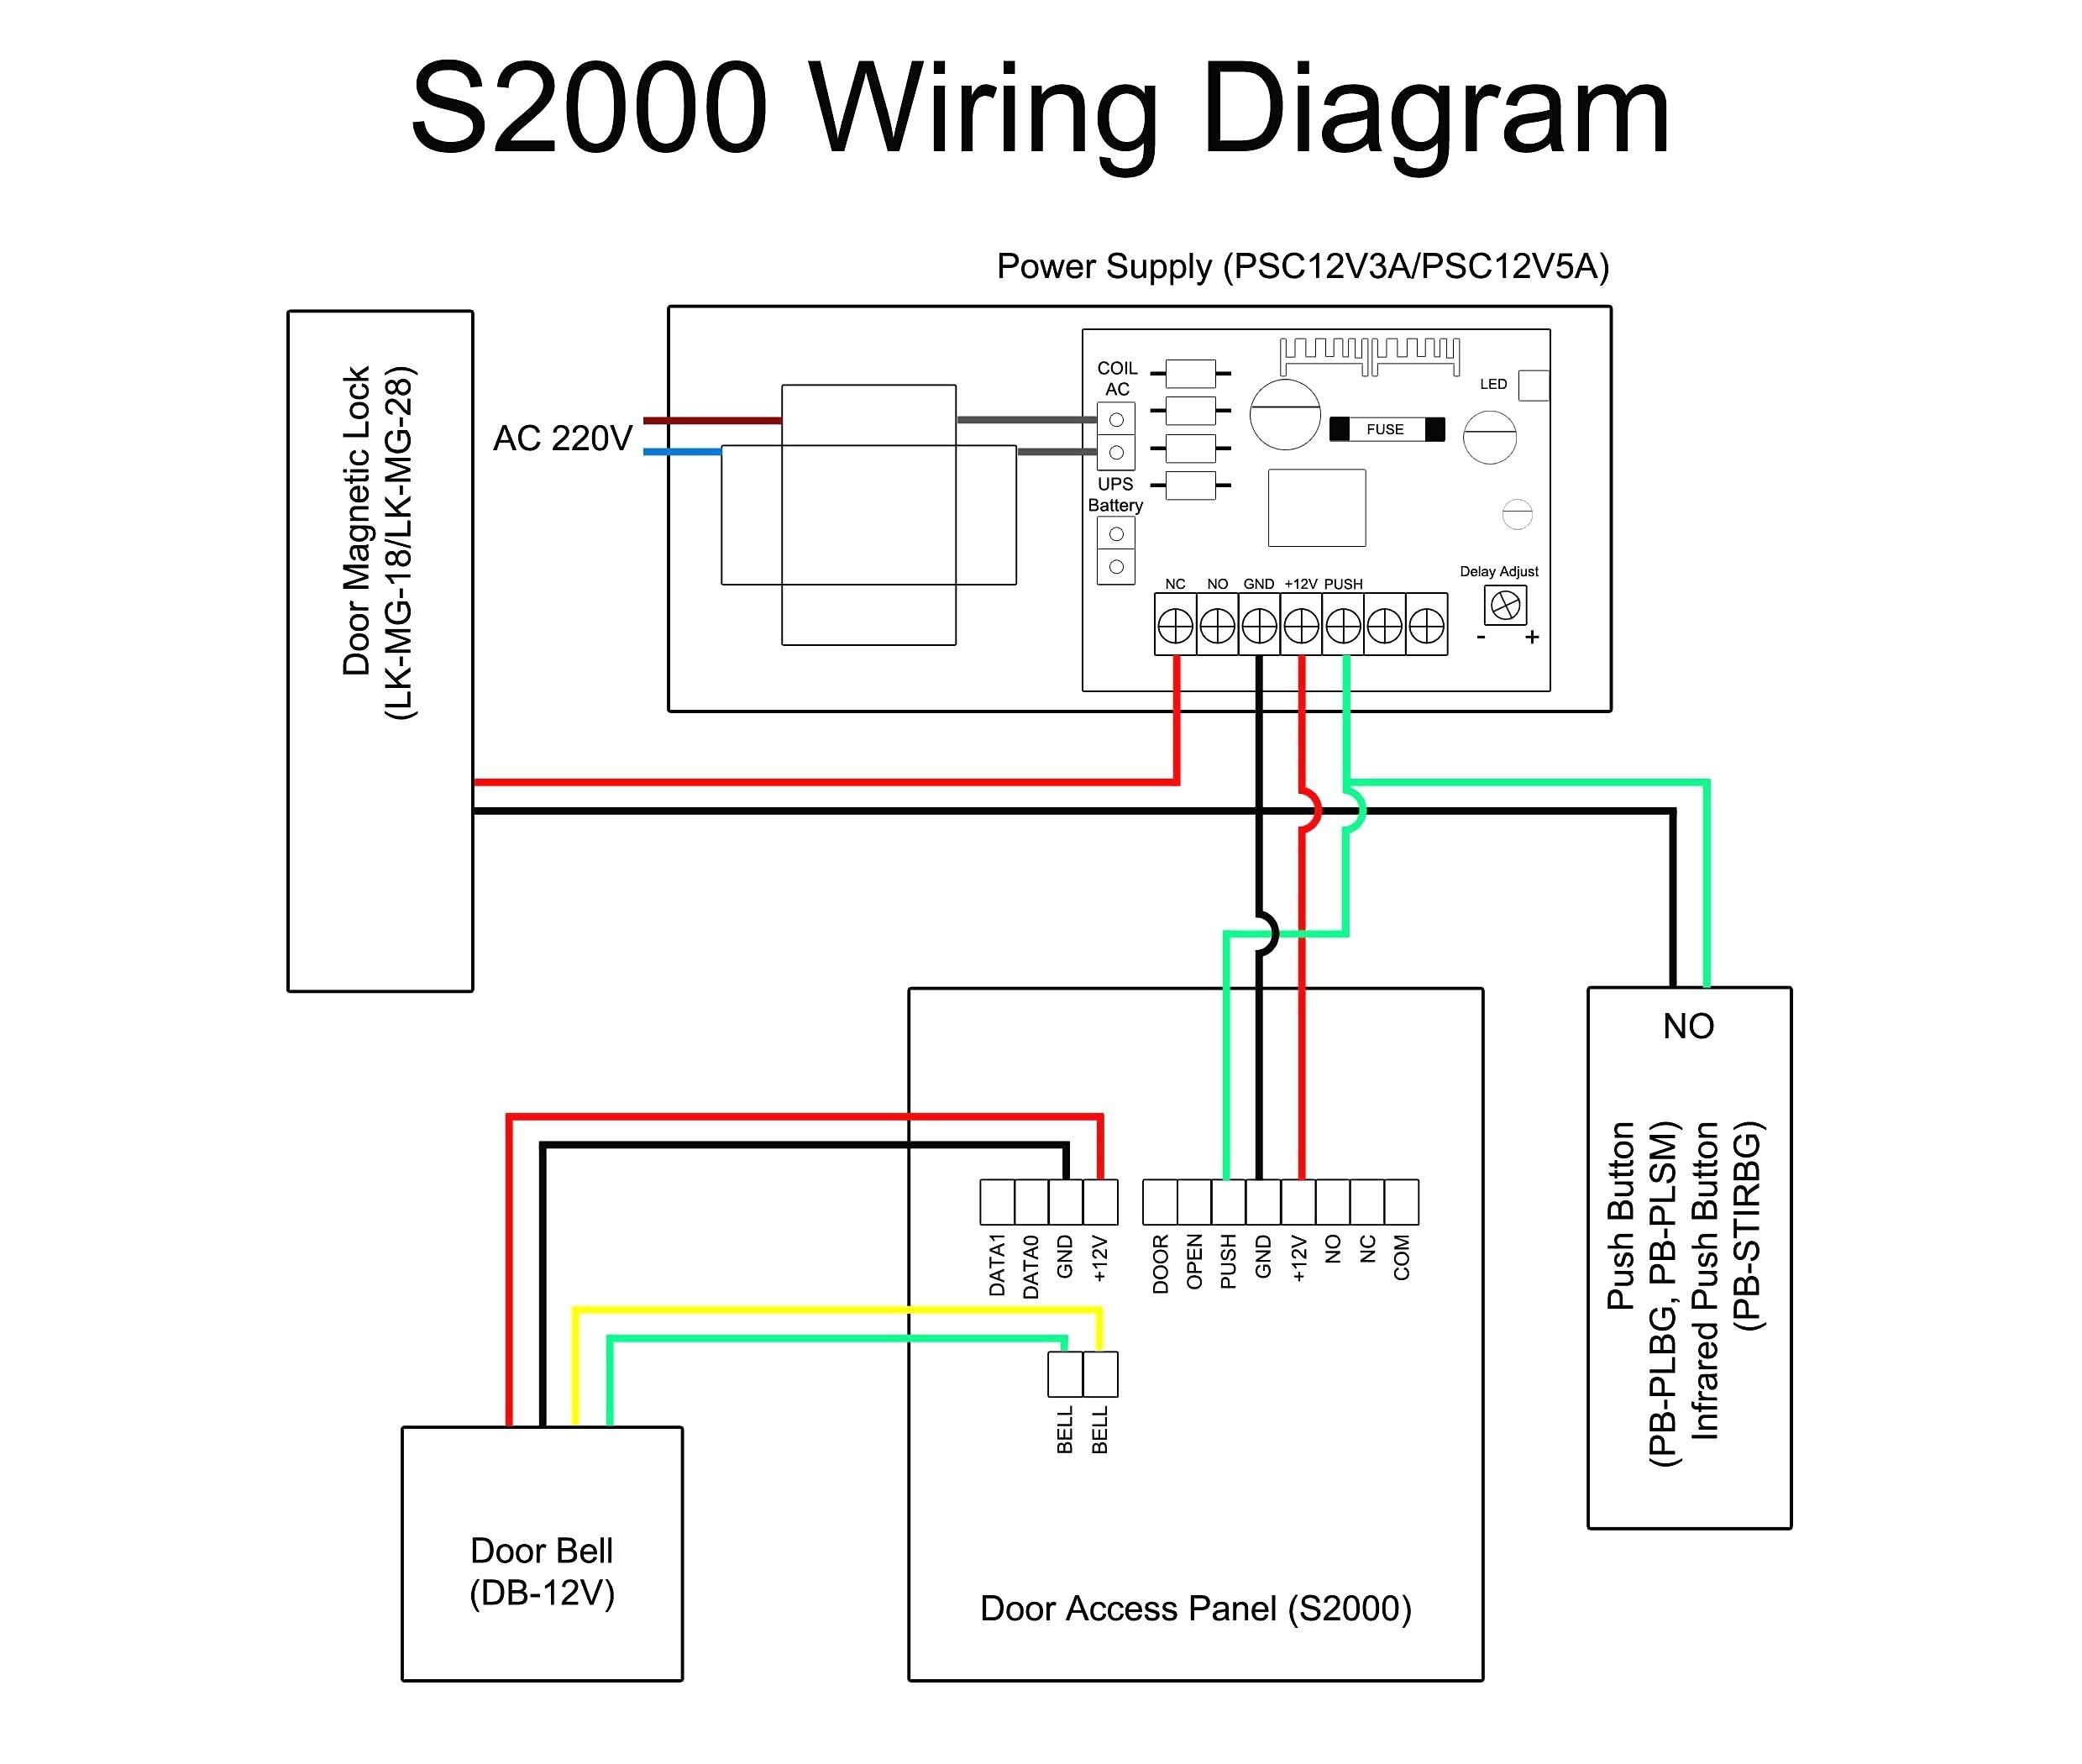 Bunker Hill Security Camera Wiring Diagram New Ccd Camera Circuit Diagram Beautiful Cmos Camera Wiring Diagram